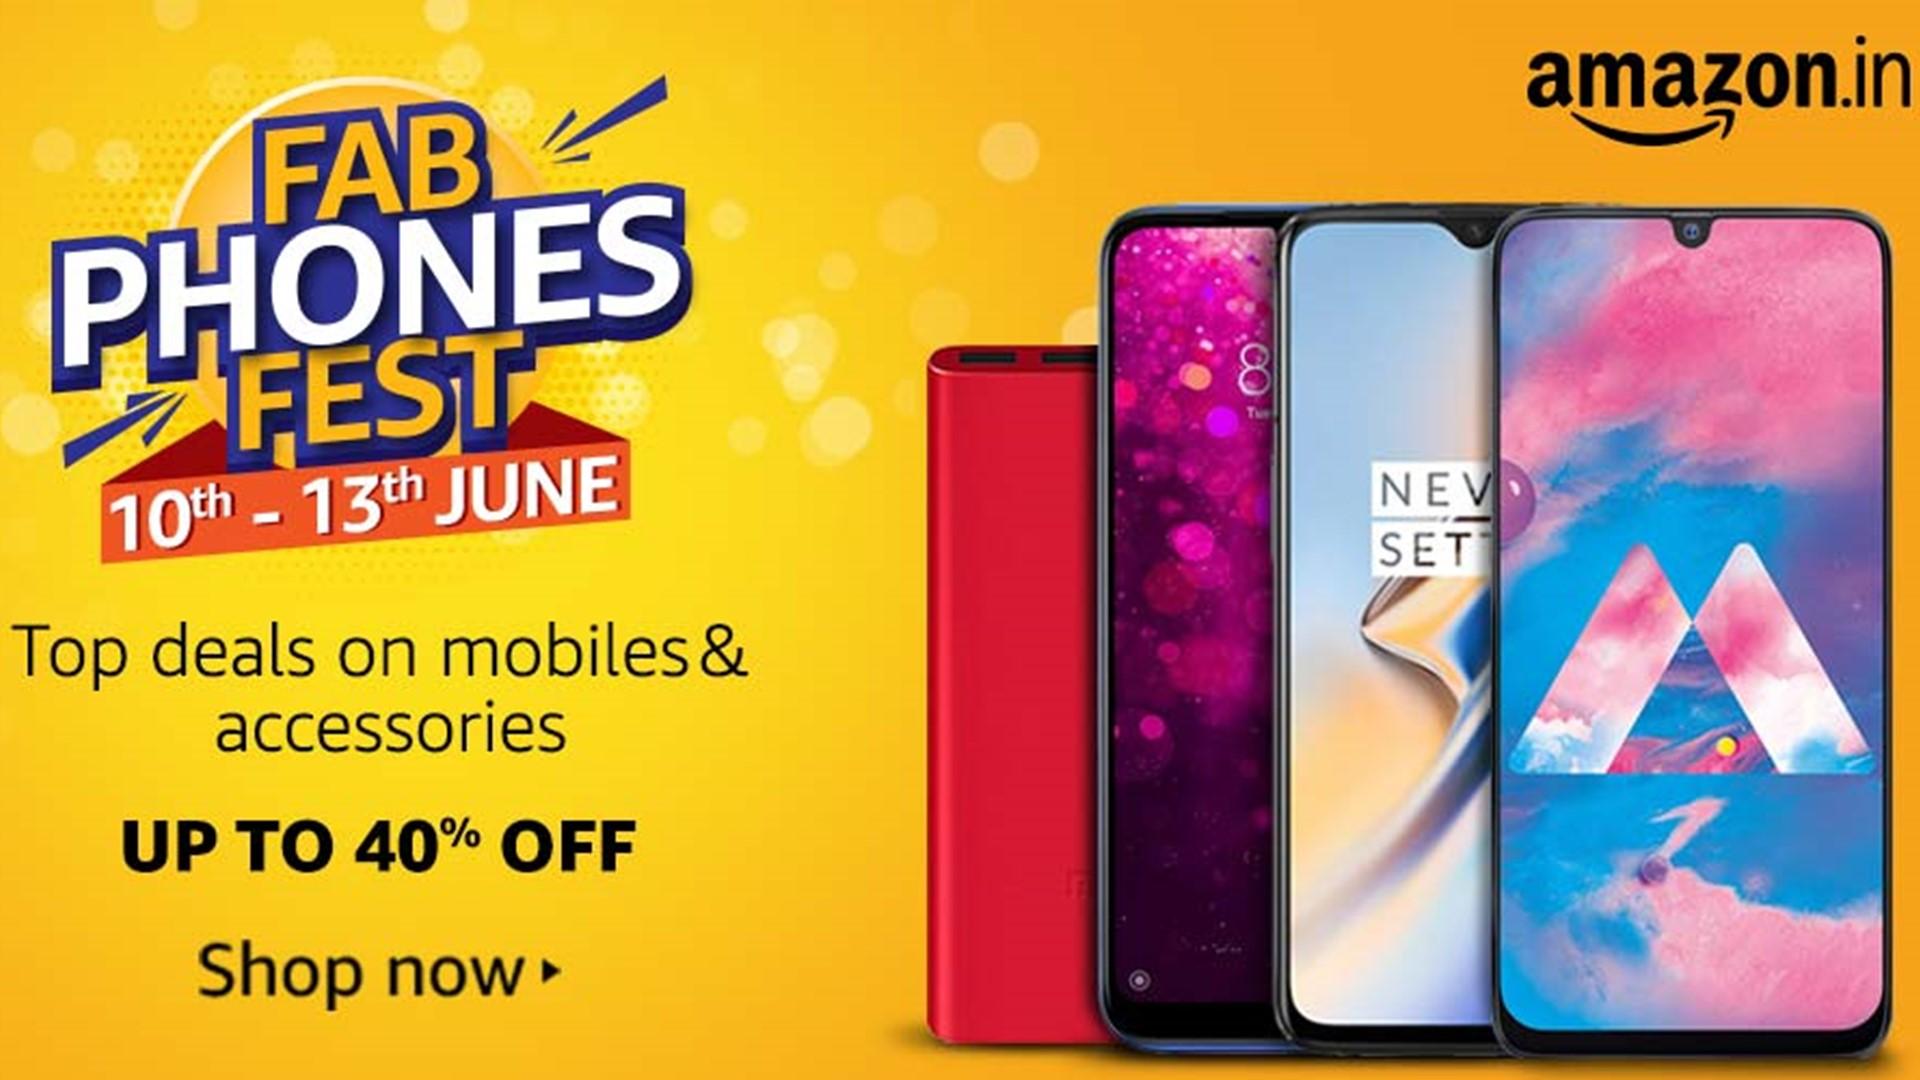 Amazon India Fab Phones Fest 2019 kicks off with upto 40% off on